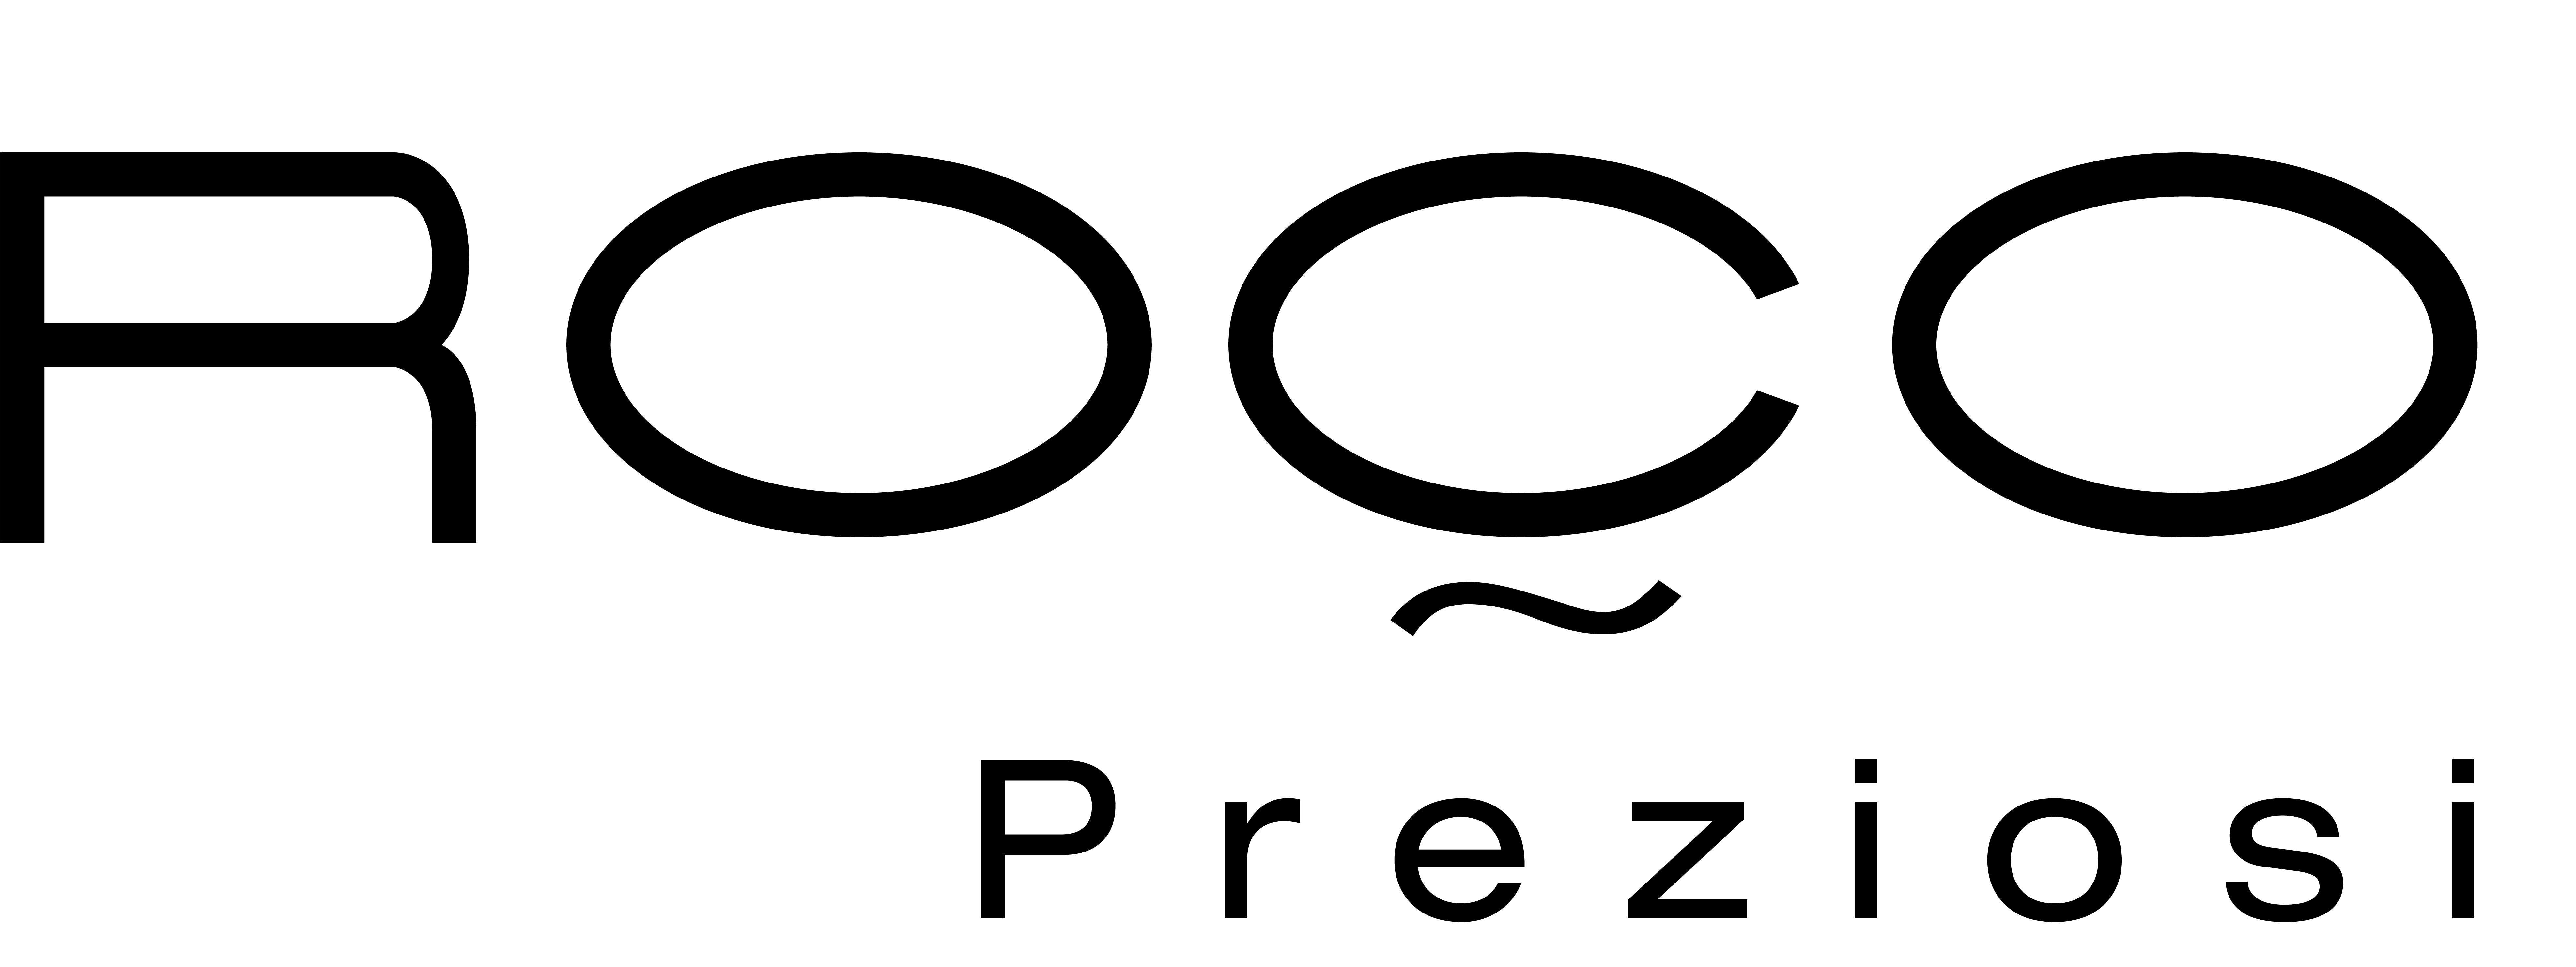 roçopreziosi